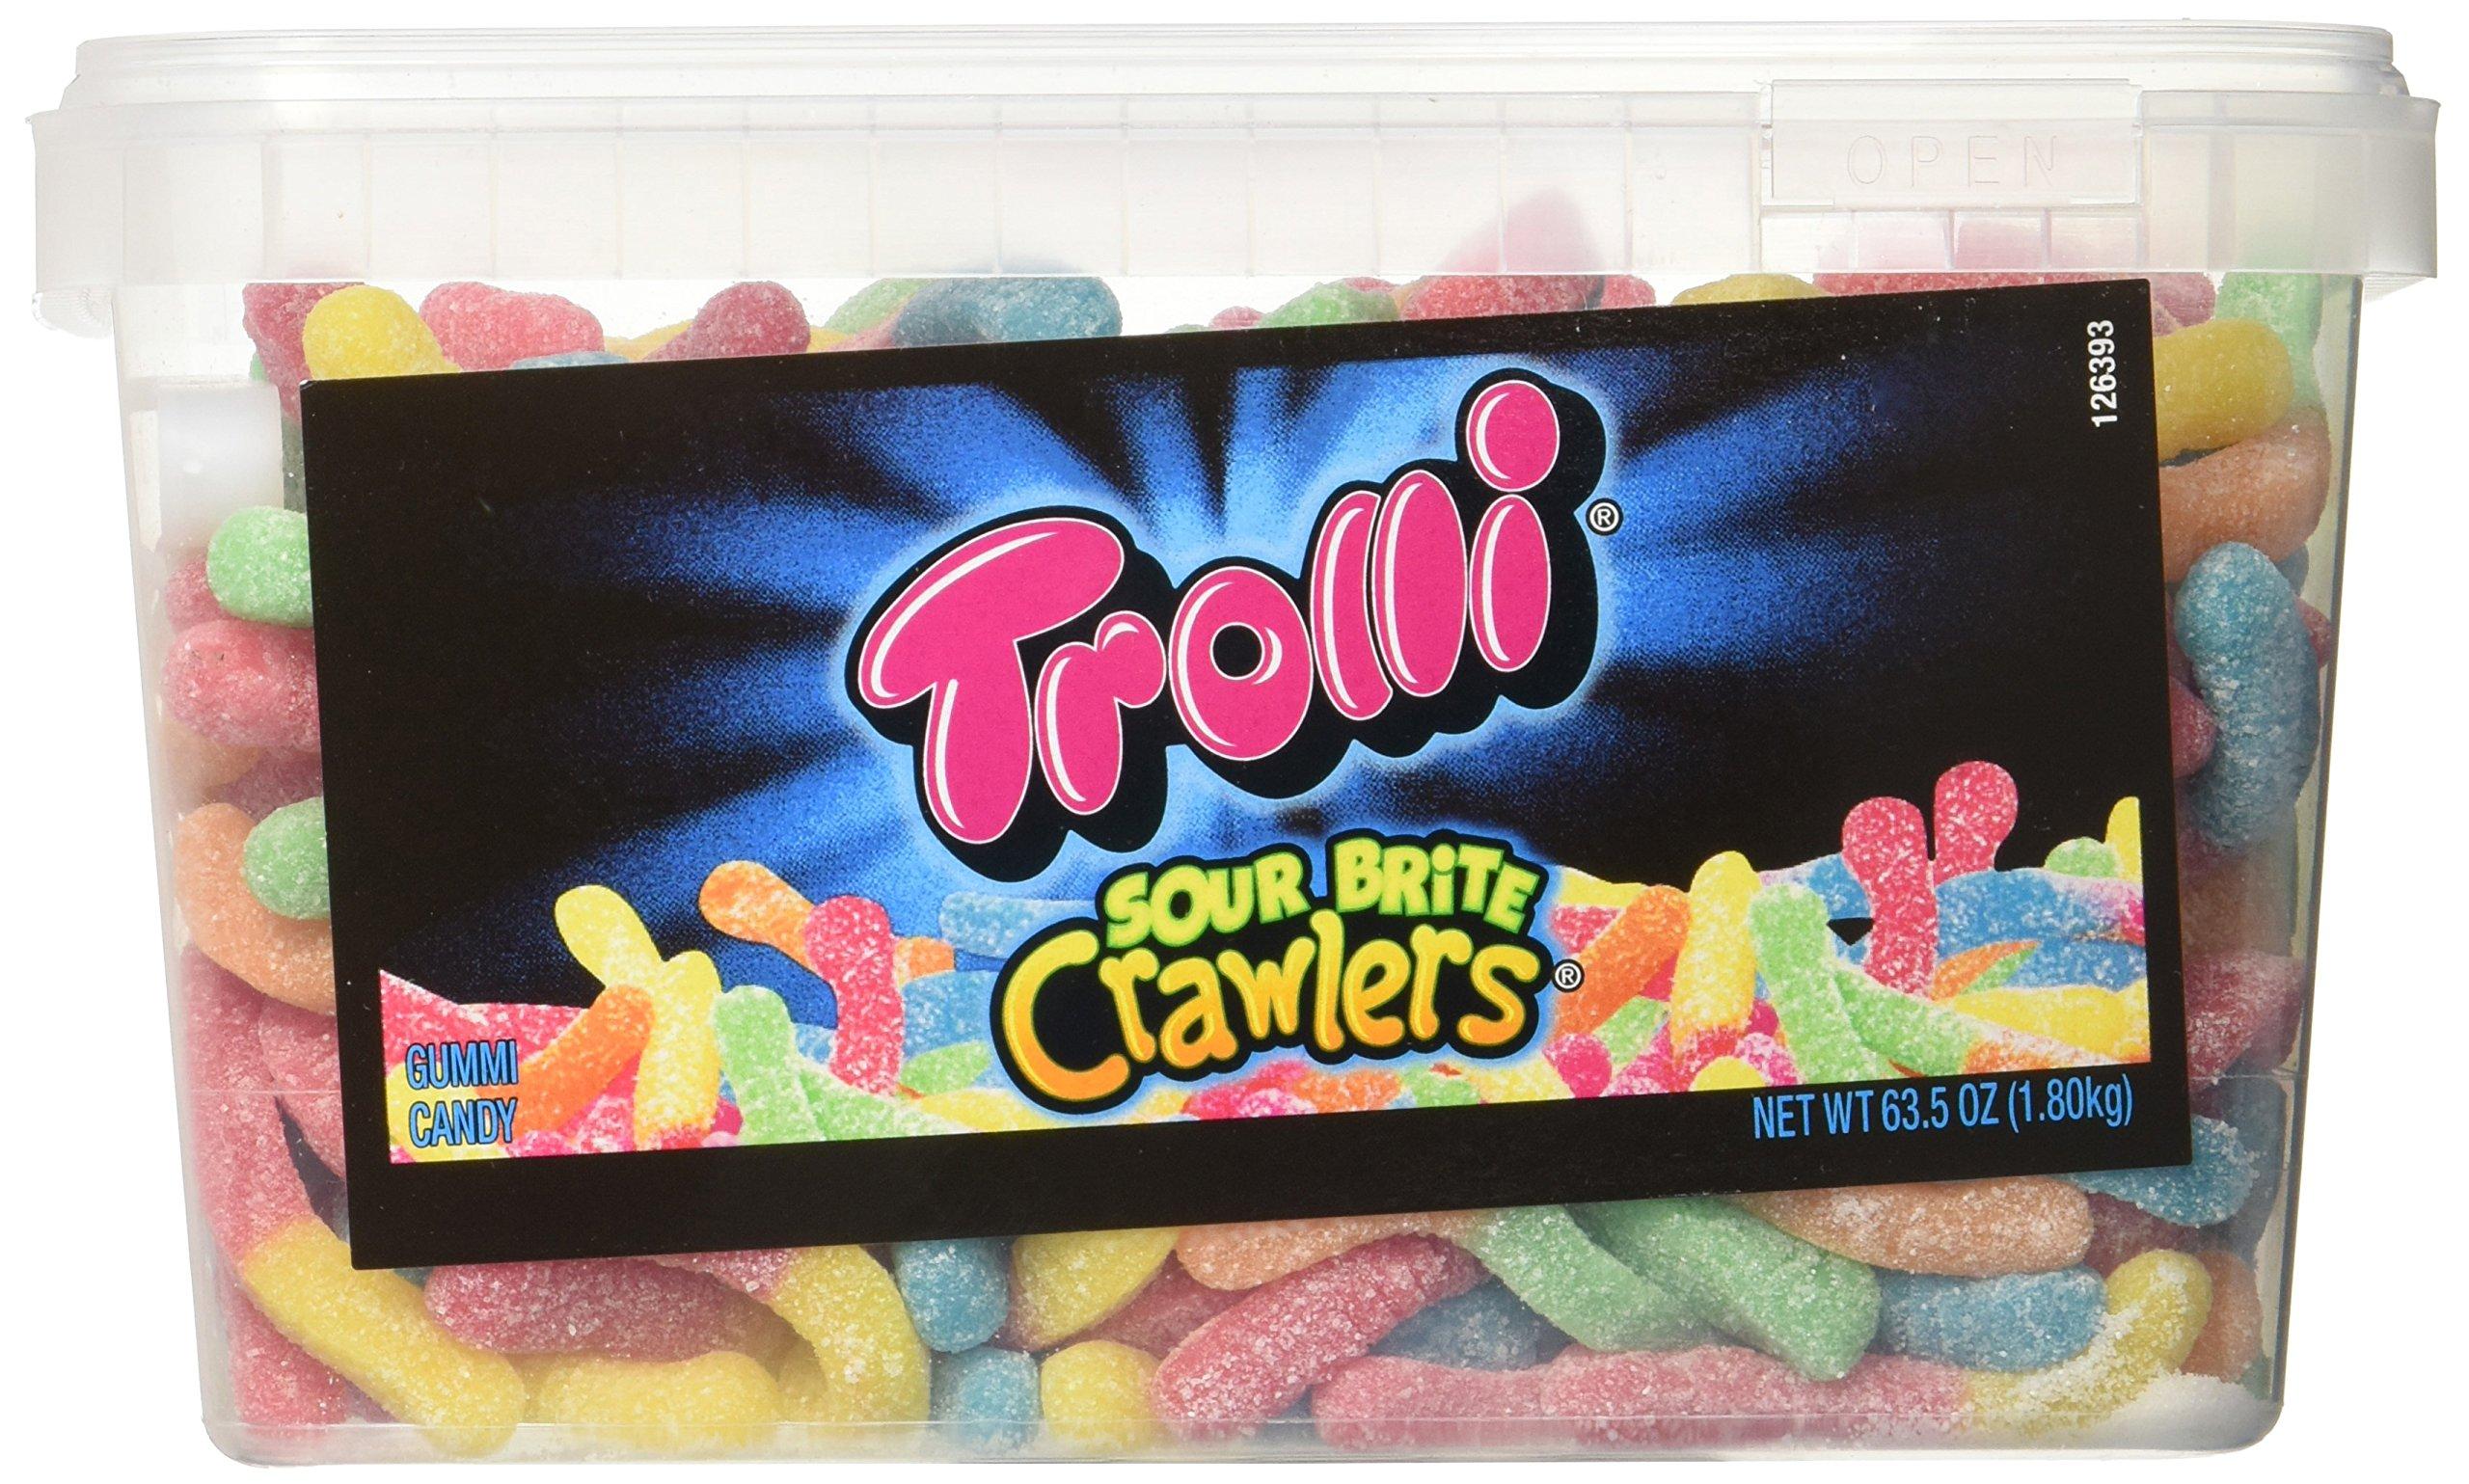 Trolli Sour Brite Crawlers Gummy Worms, 3.96 Pound Tub Sour Gummy Worms by Trolli